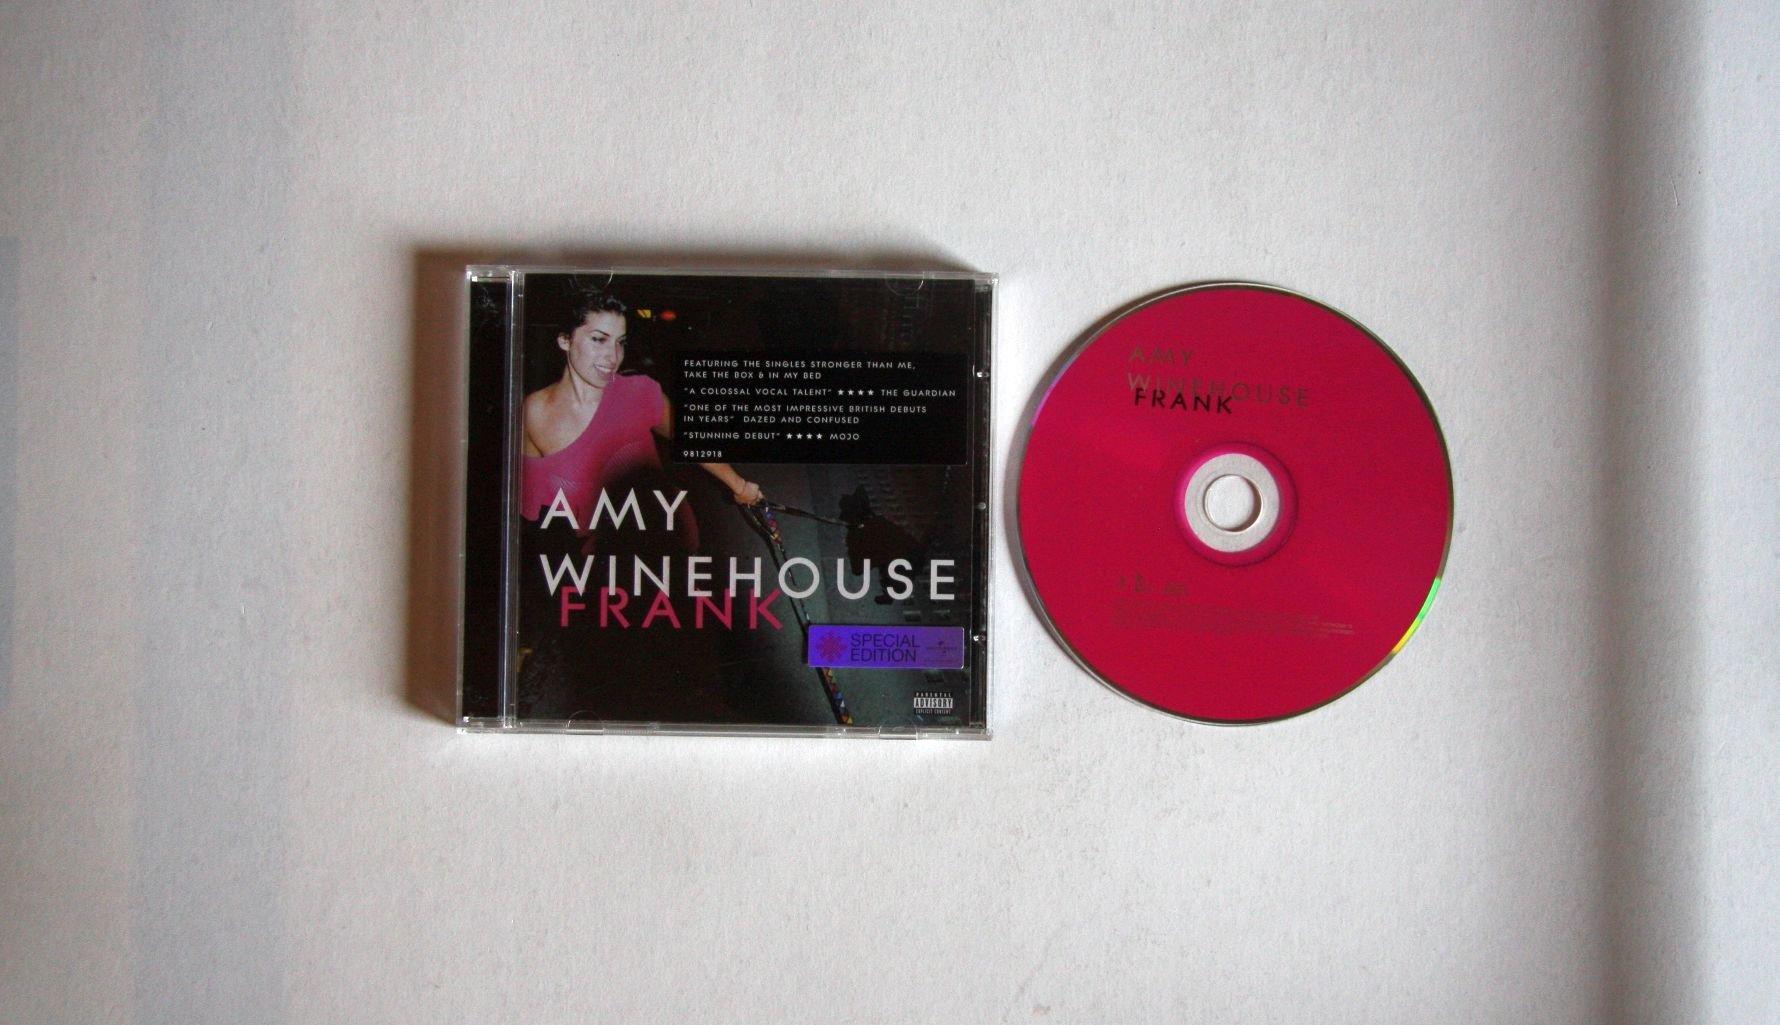 Amy Winehouse - Frank Album